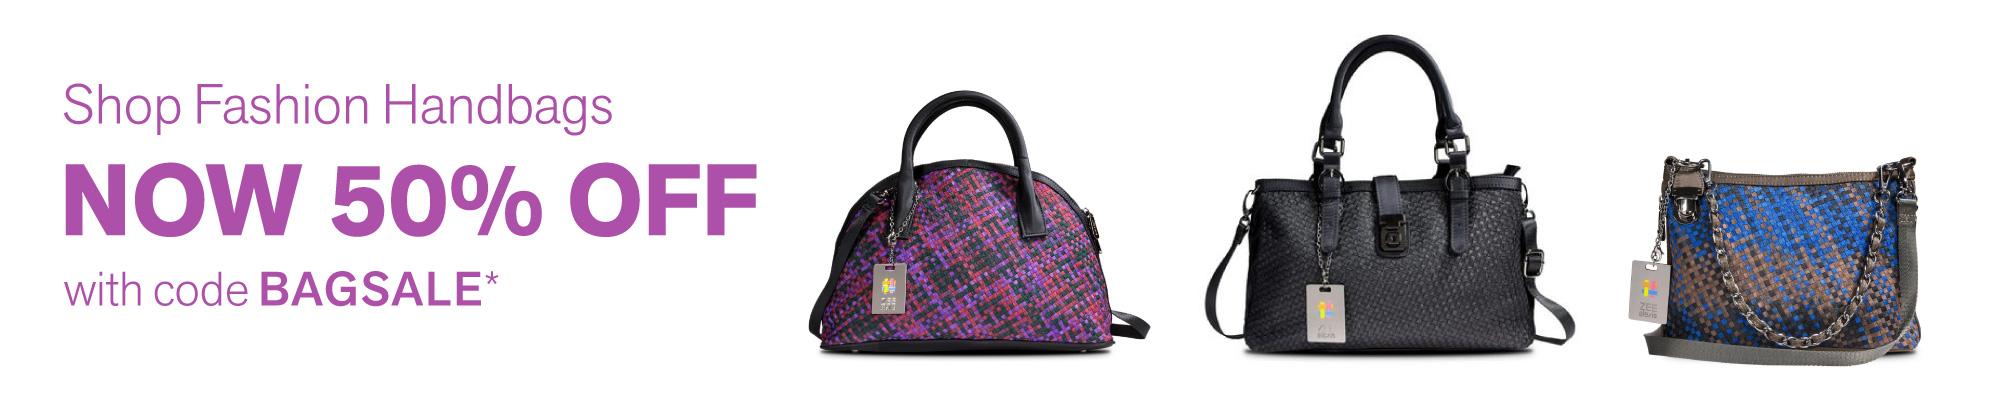 2014-handbag-sale-banner.jpg